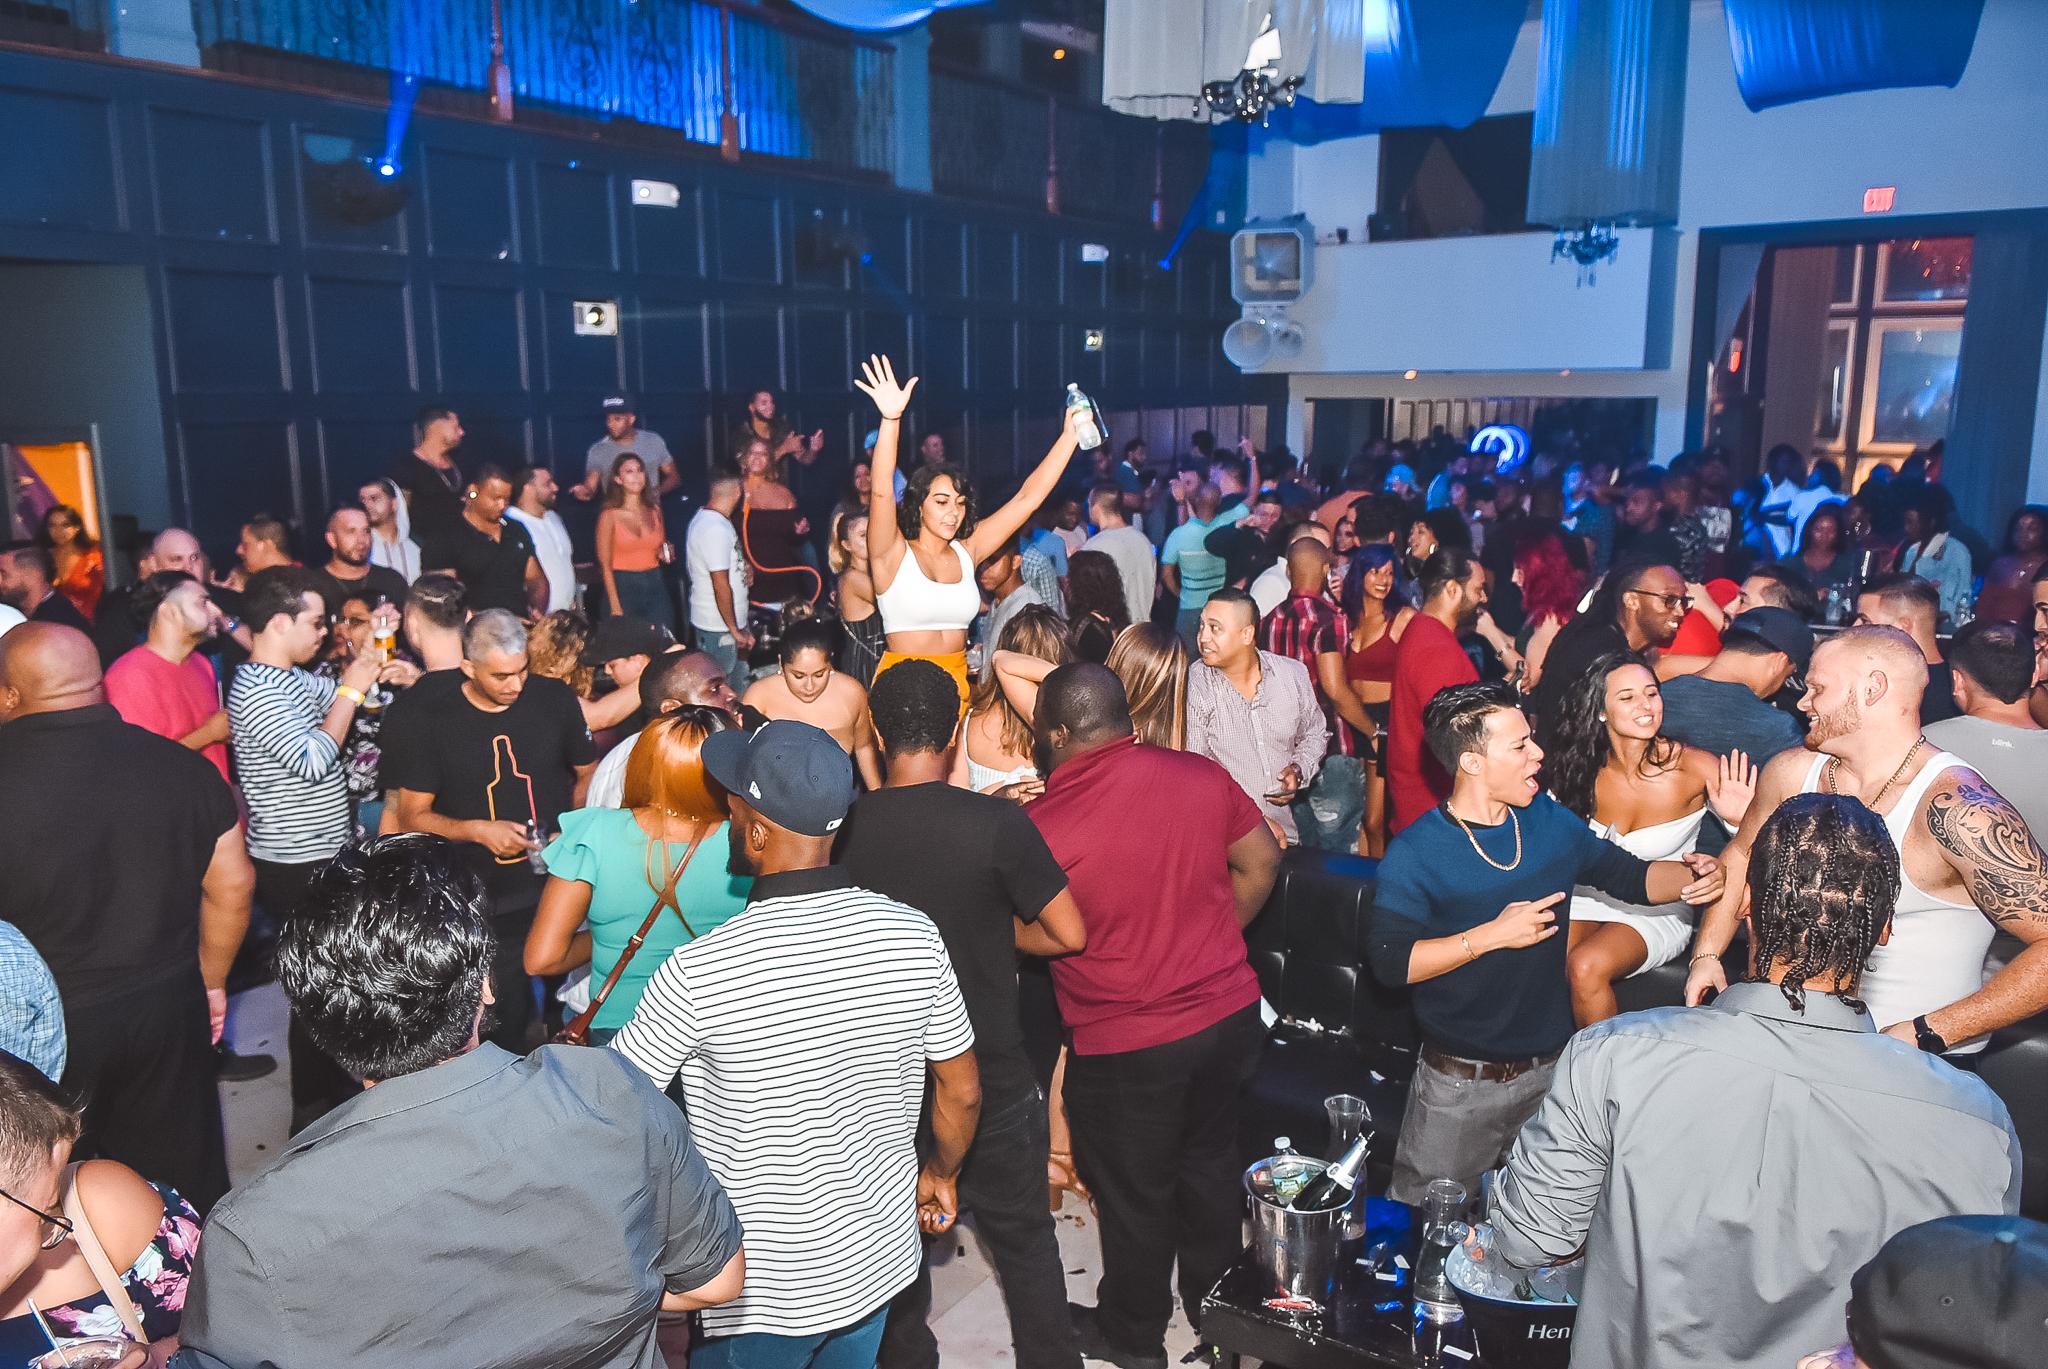 8.31.18 - DJ PEREIRA & DJ HAZE